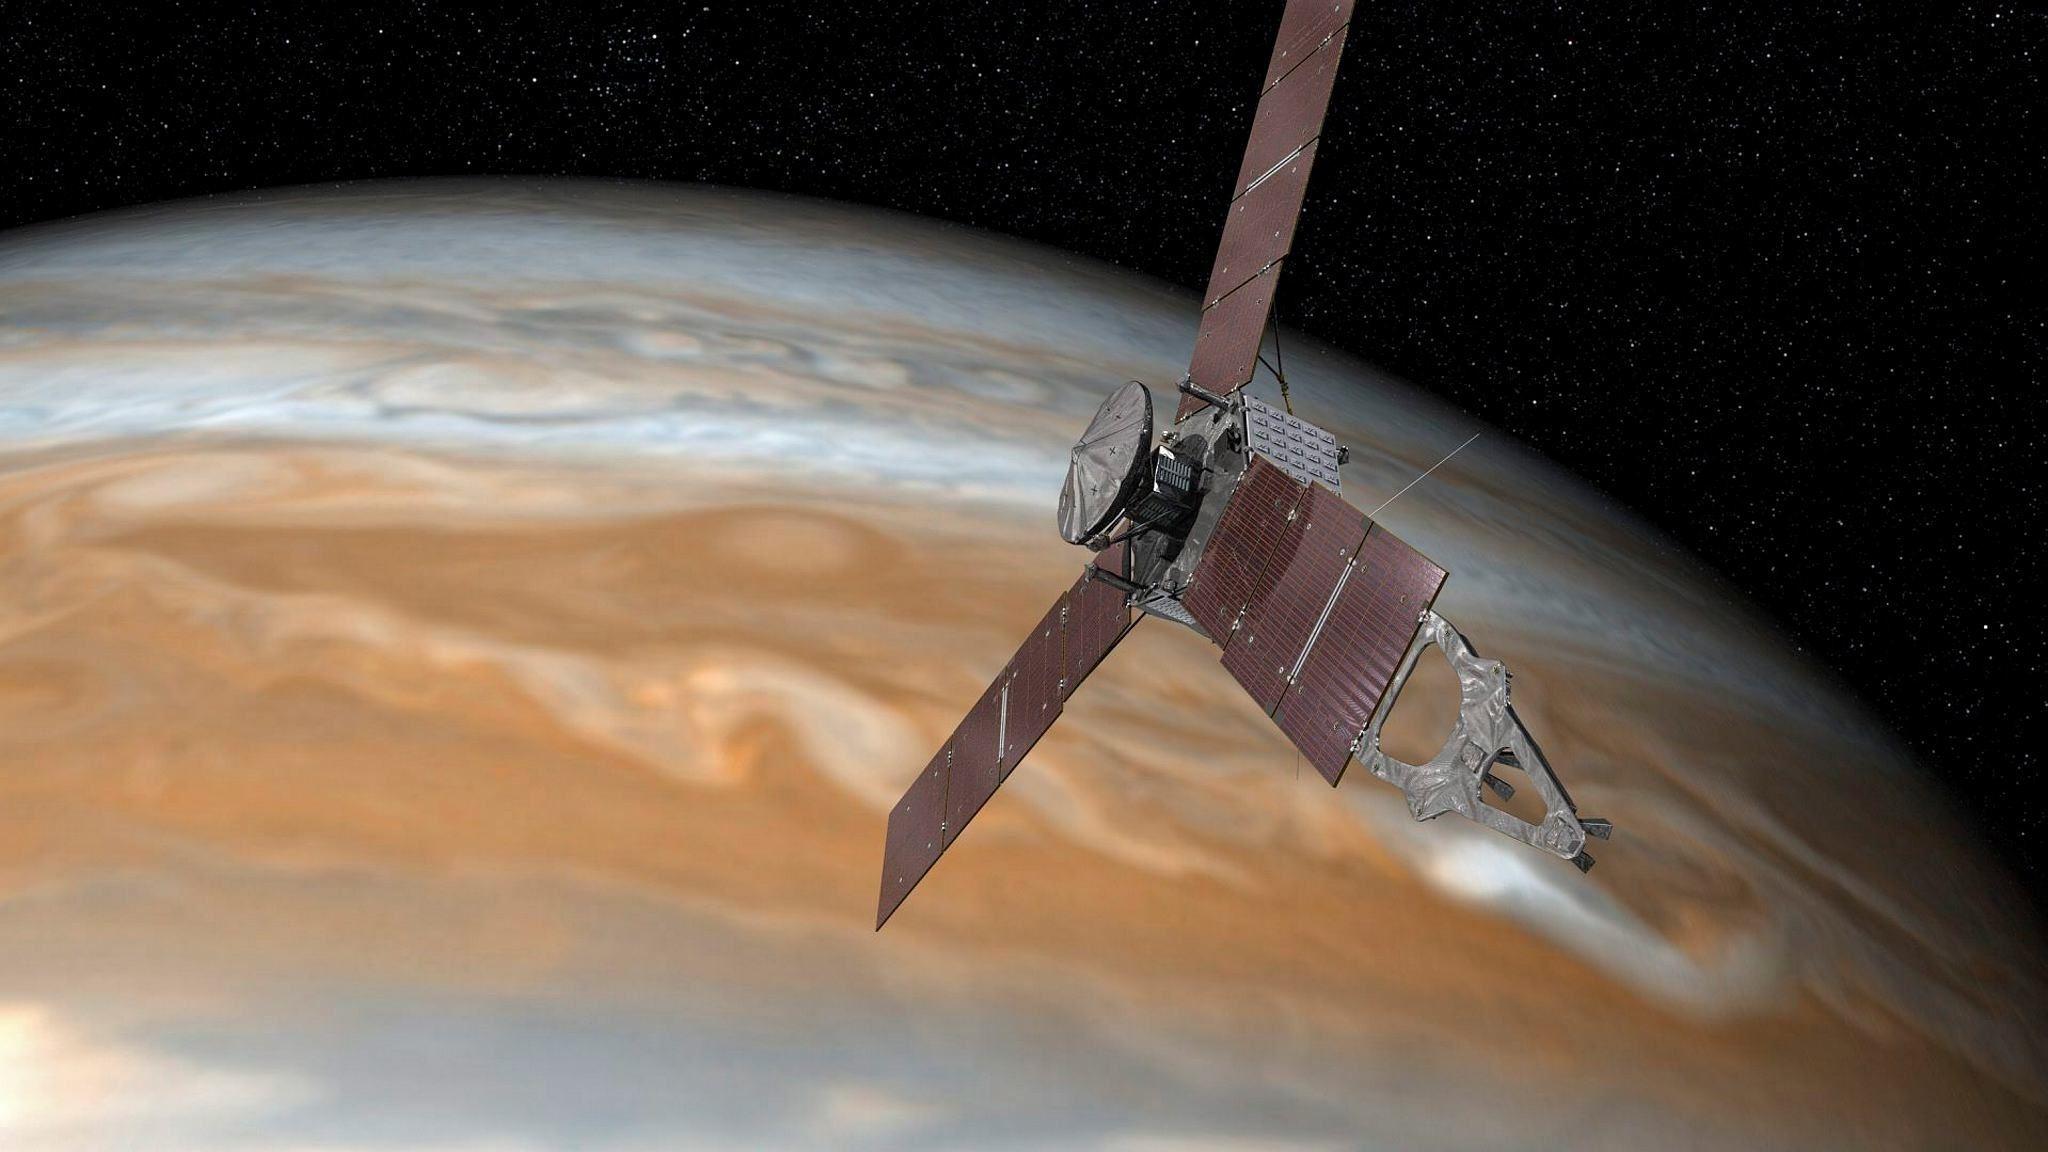 NASA's Juno spacecraft making one of its close passes over Jupiter. (EPA Photo)